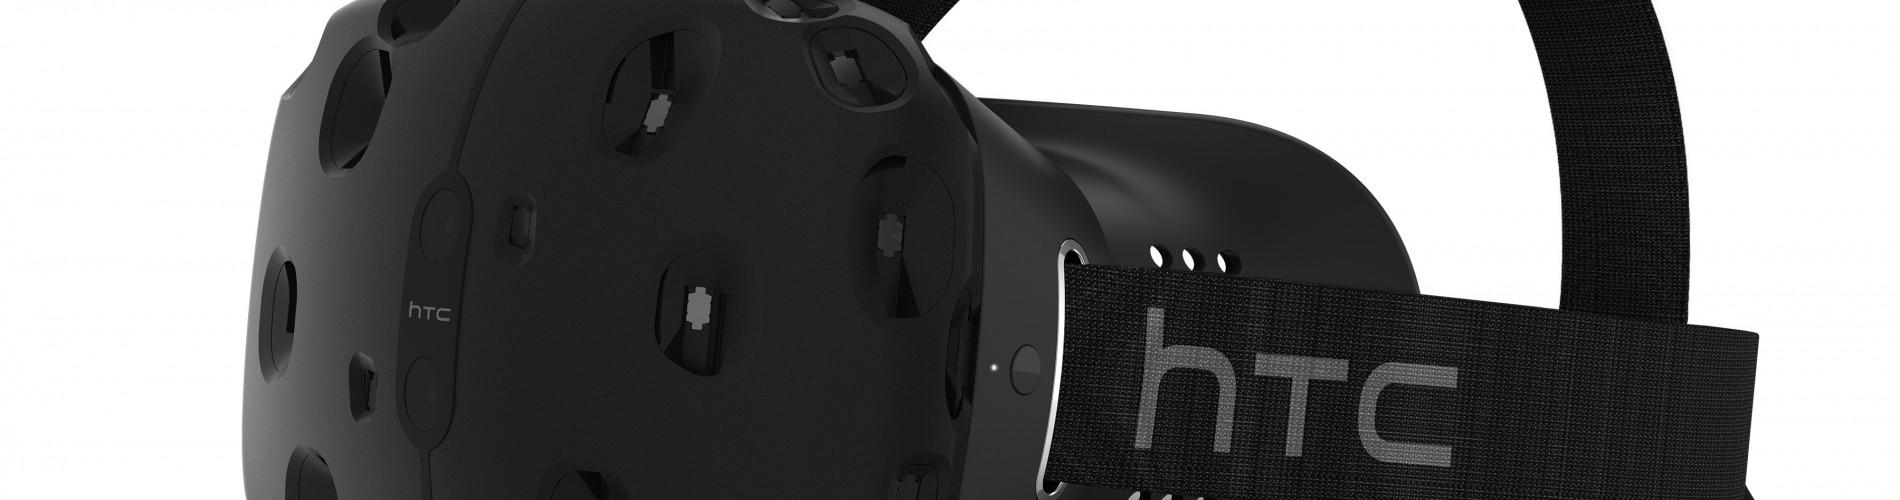 HTC Vive won't ship until Q1 2016